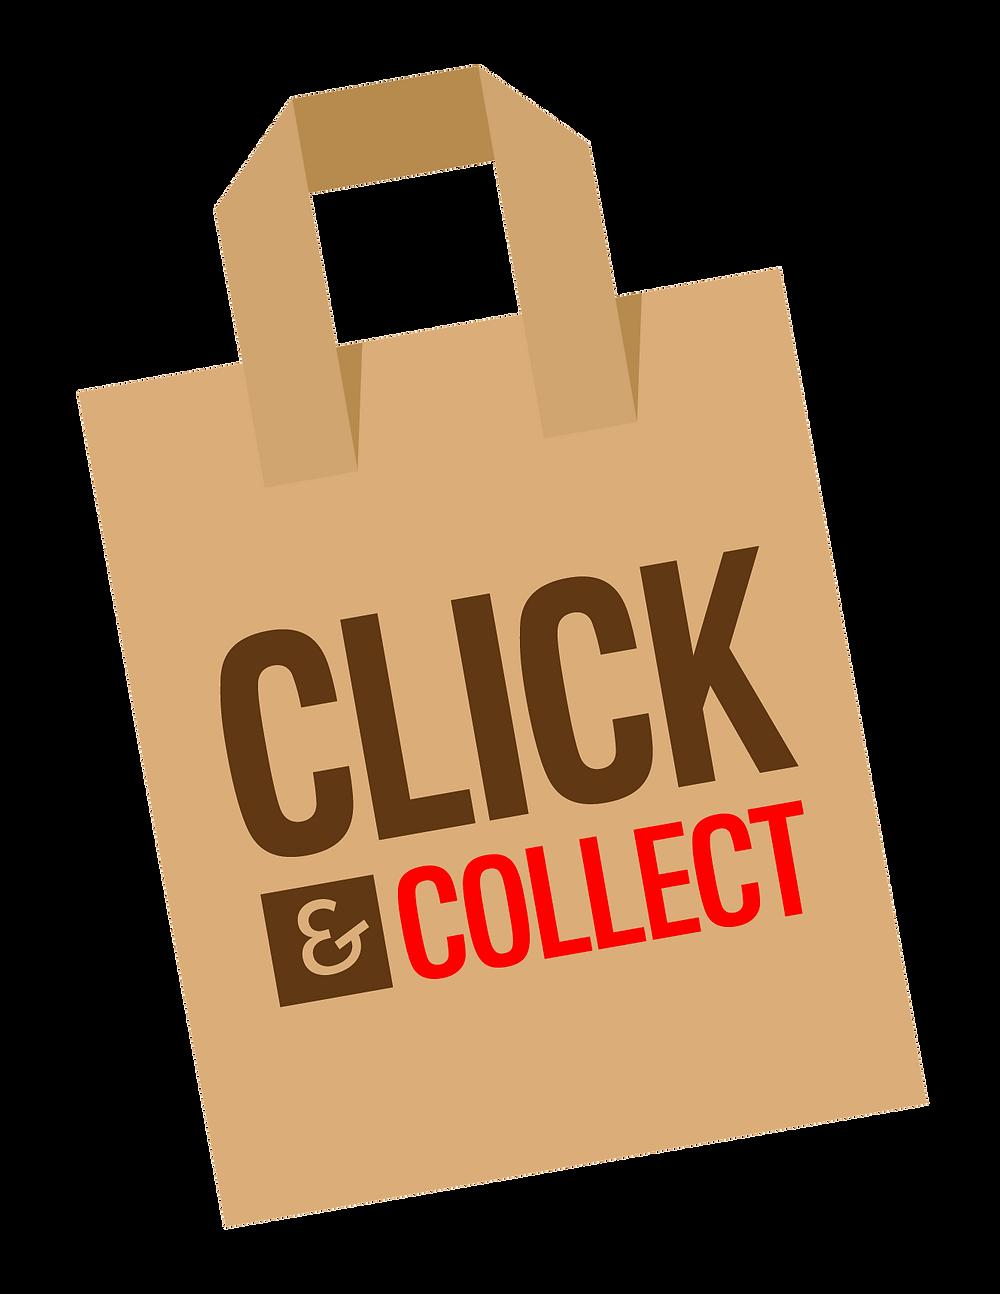 click and collect plateforme de vente en ligne